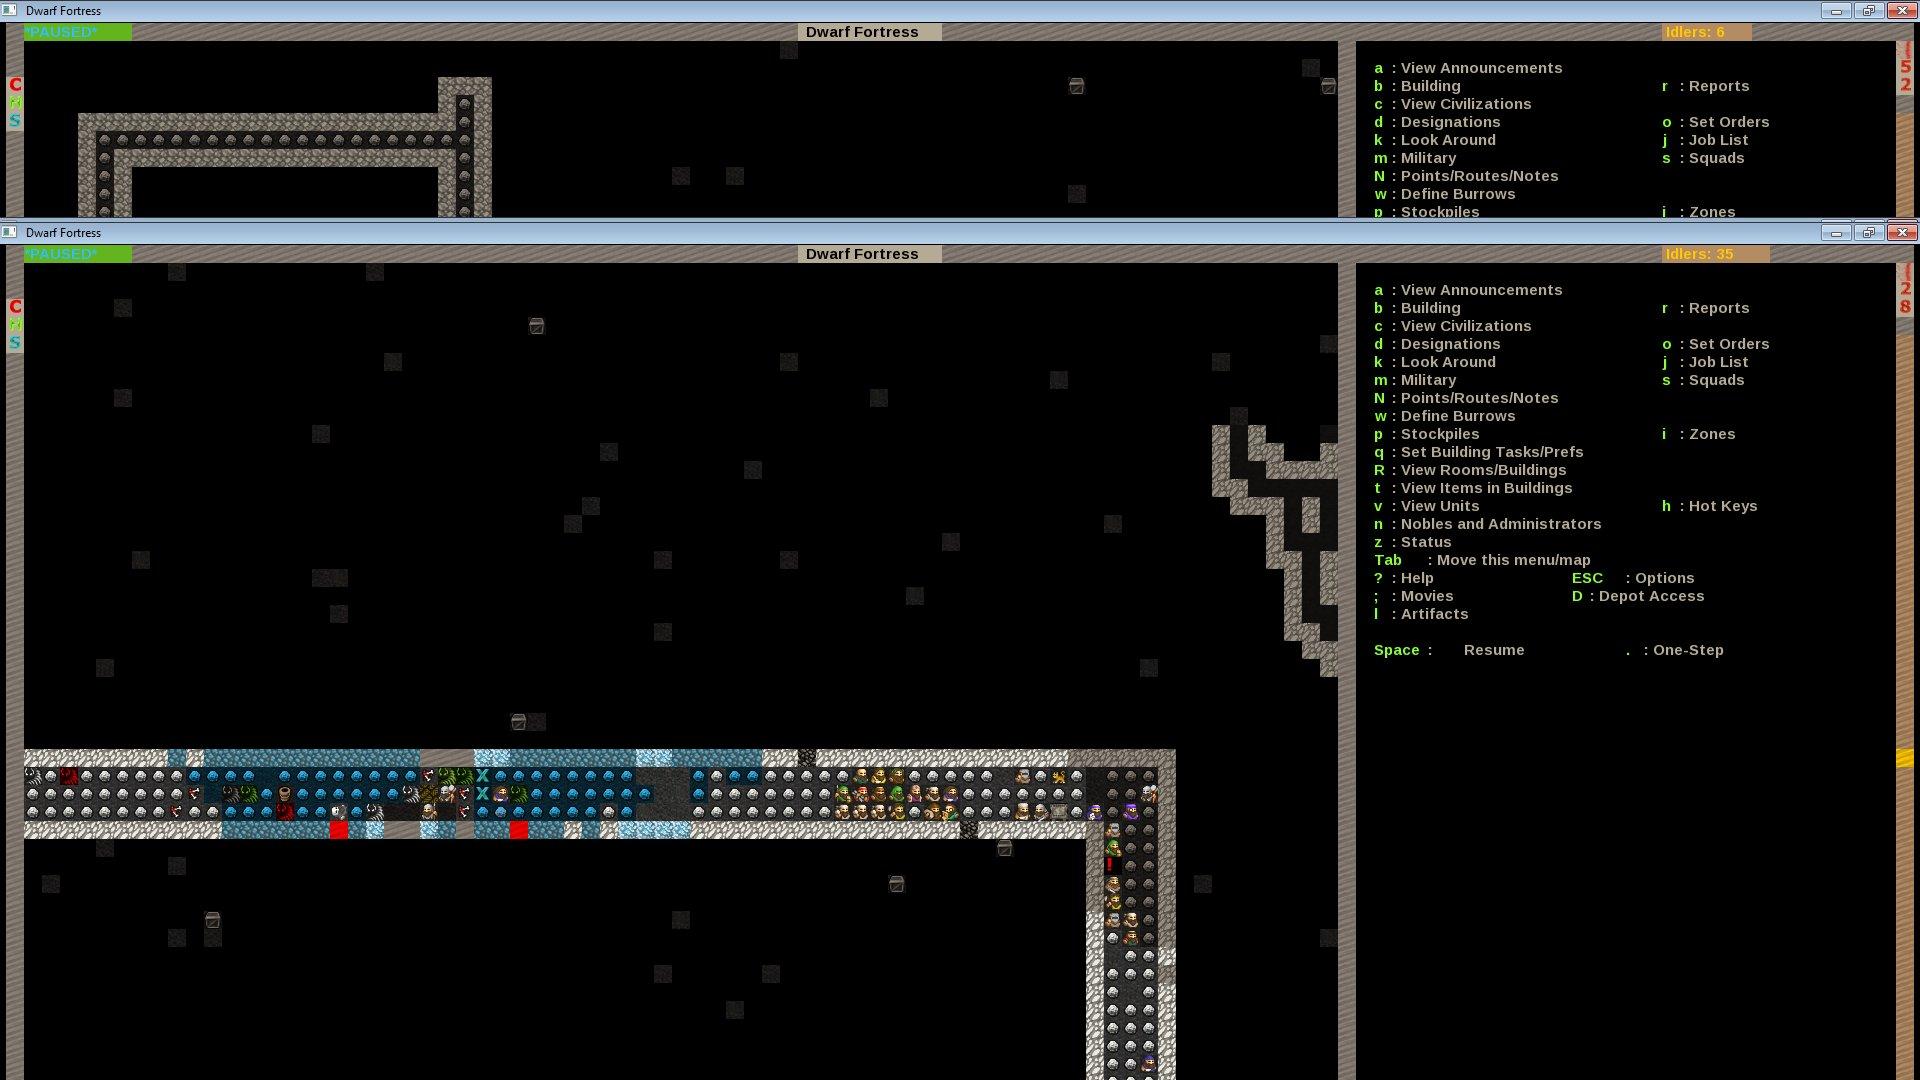 Dwarf Fortress  - Page 2 0f4fb359-ae27-44bb-8ec4-c1ea1707007b